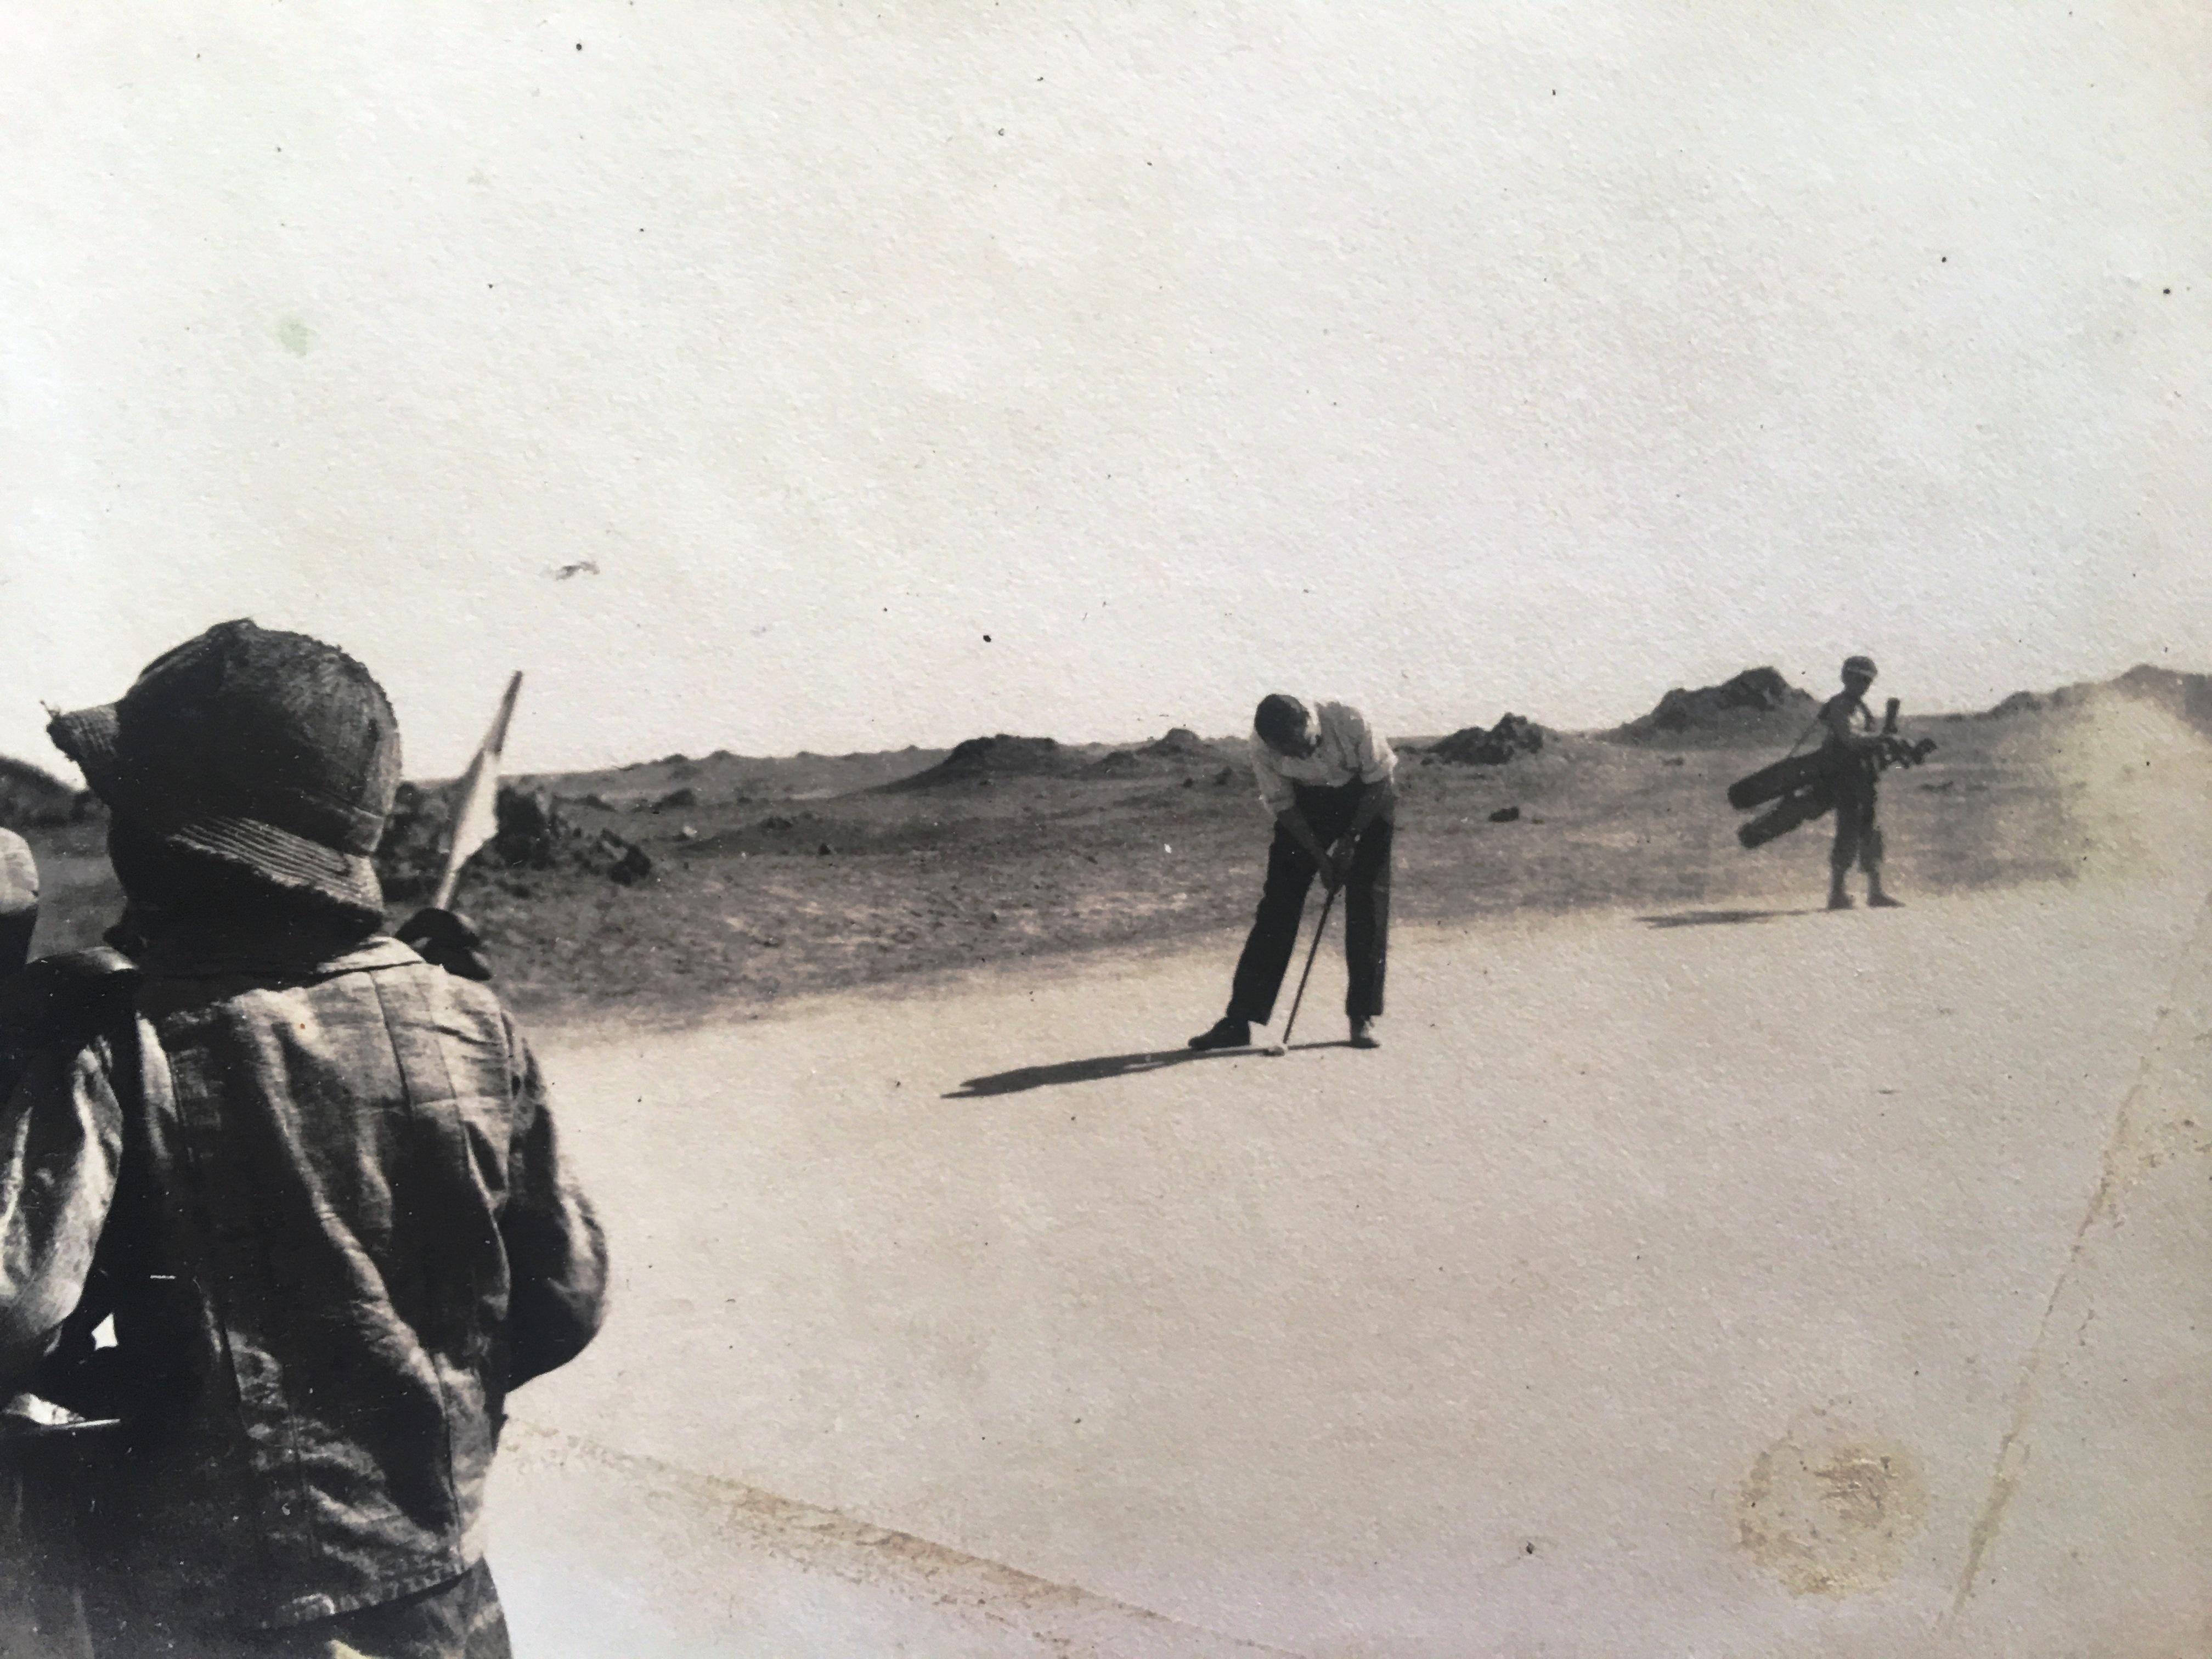 Enterreno - Fotos históricas de chile - fotos antiguas de Chile - Antofagasta Golf Club, 1921